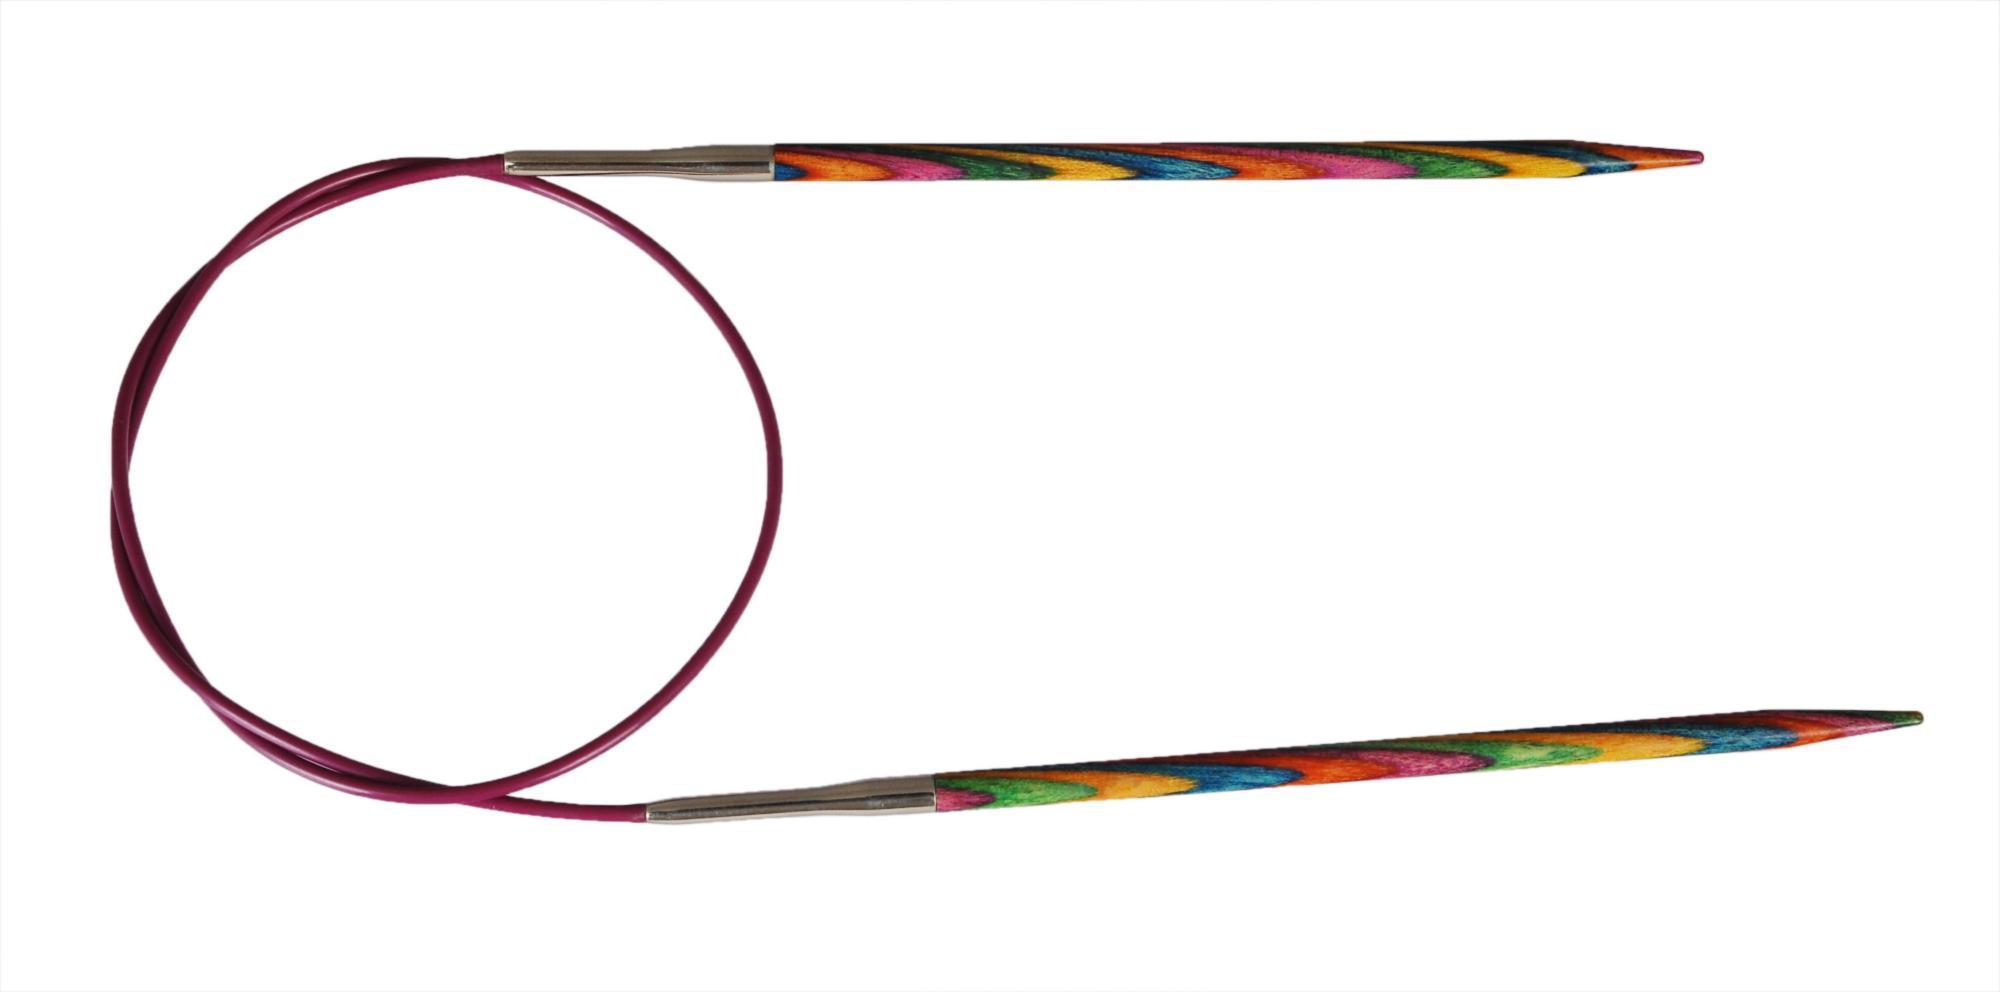 Спицы круговые 150 см Symfonie Wood KnitPro, 21385, 5.50 мм